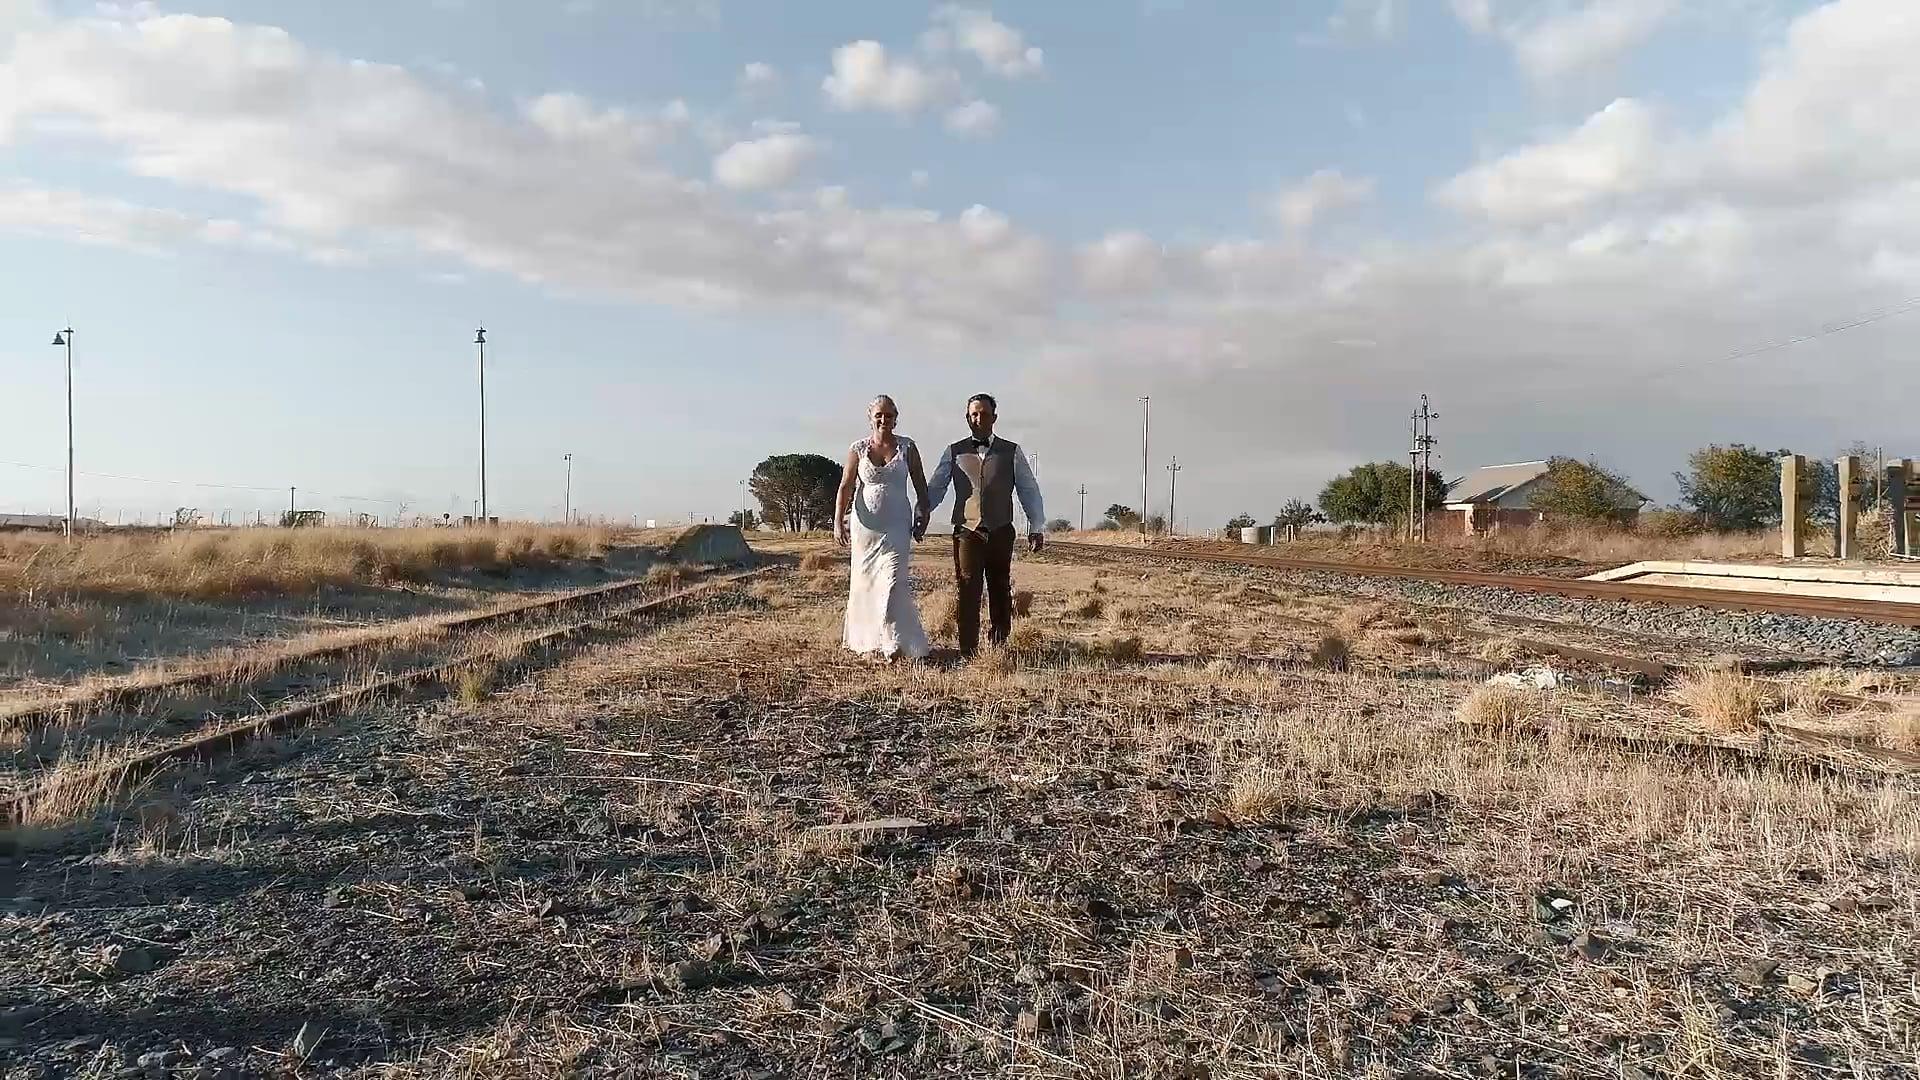 Christo and Simoné wedding preview, Het Vlock Casteel - 09 March 2019